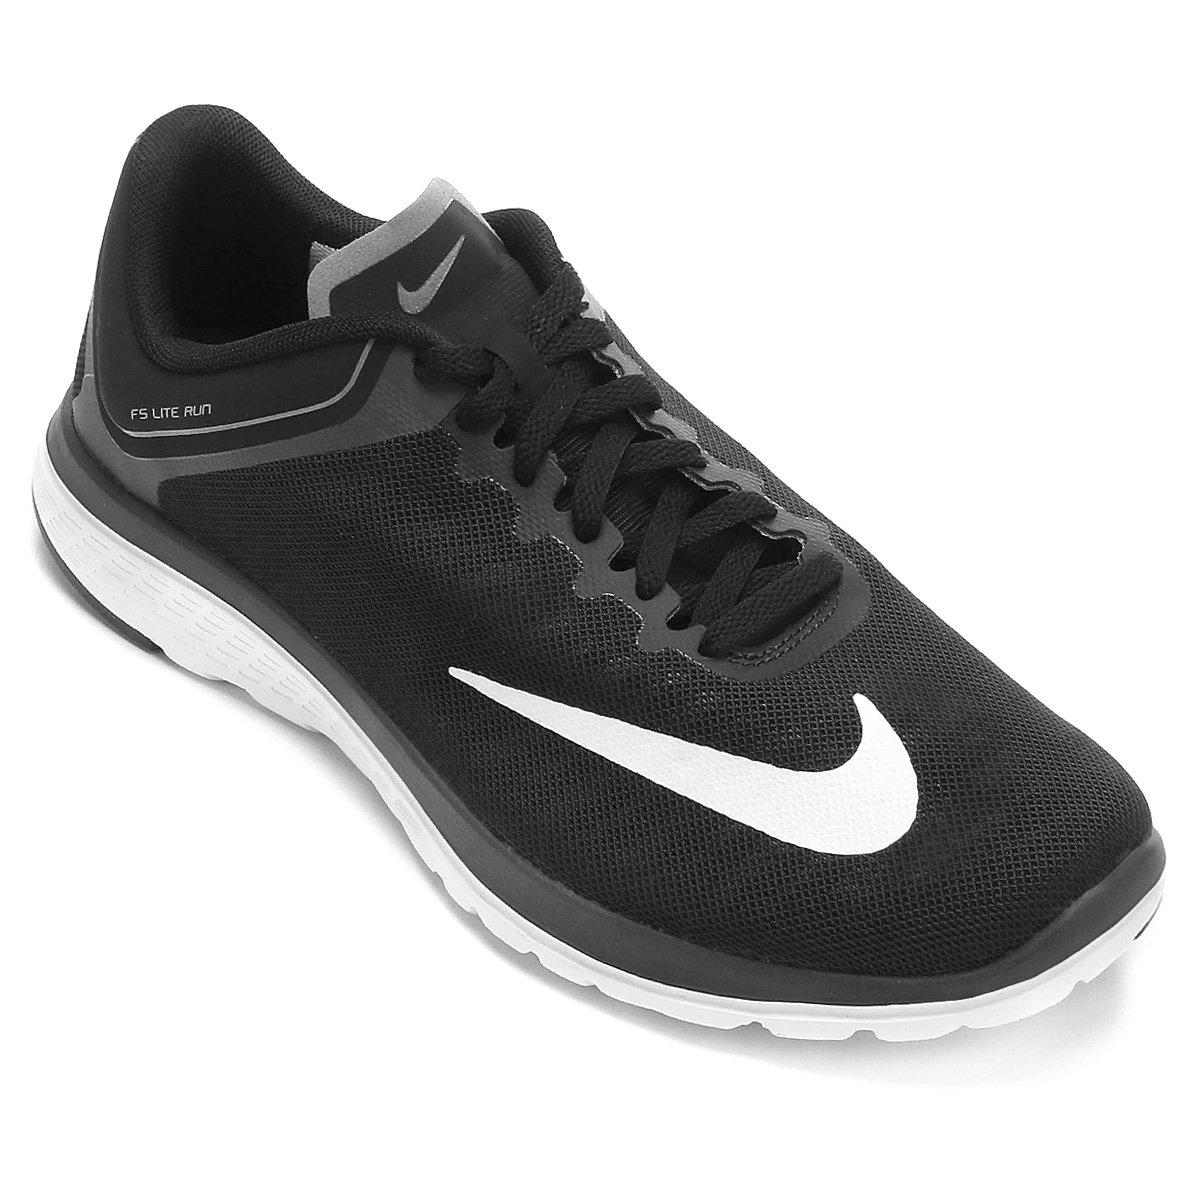 d8a468fb6d4 Tênis Nike Fs Lite Run 4 Masculino - Compre Agora